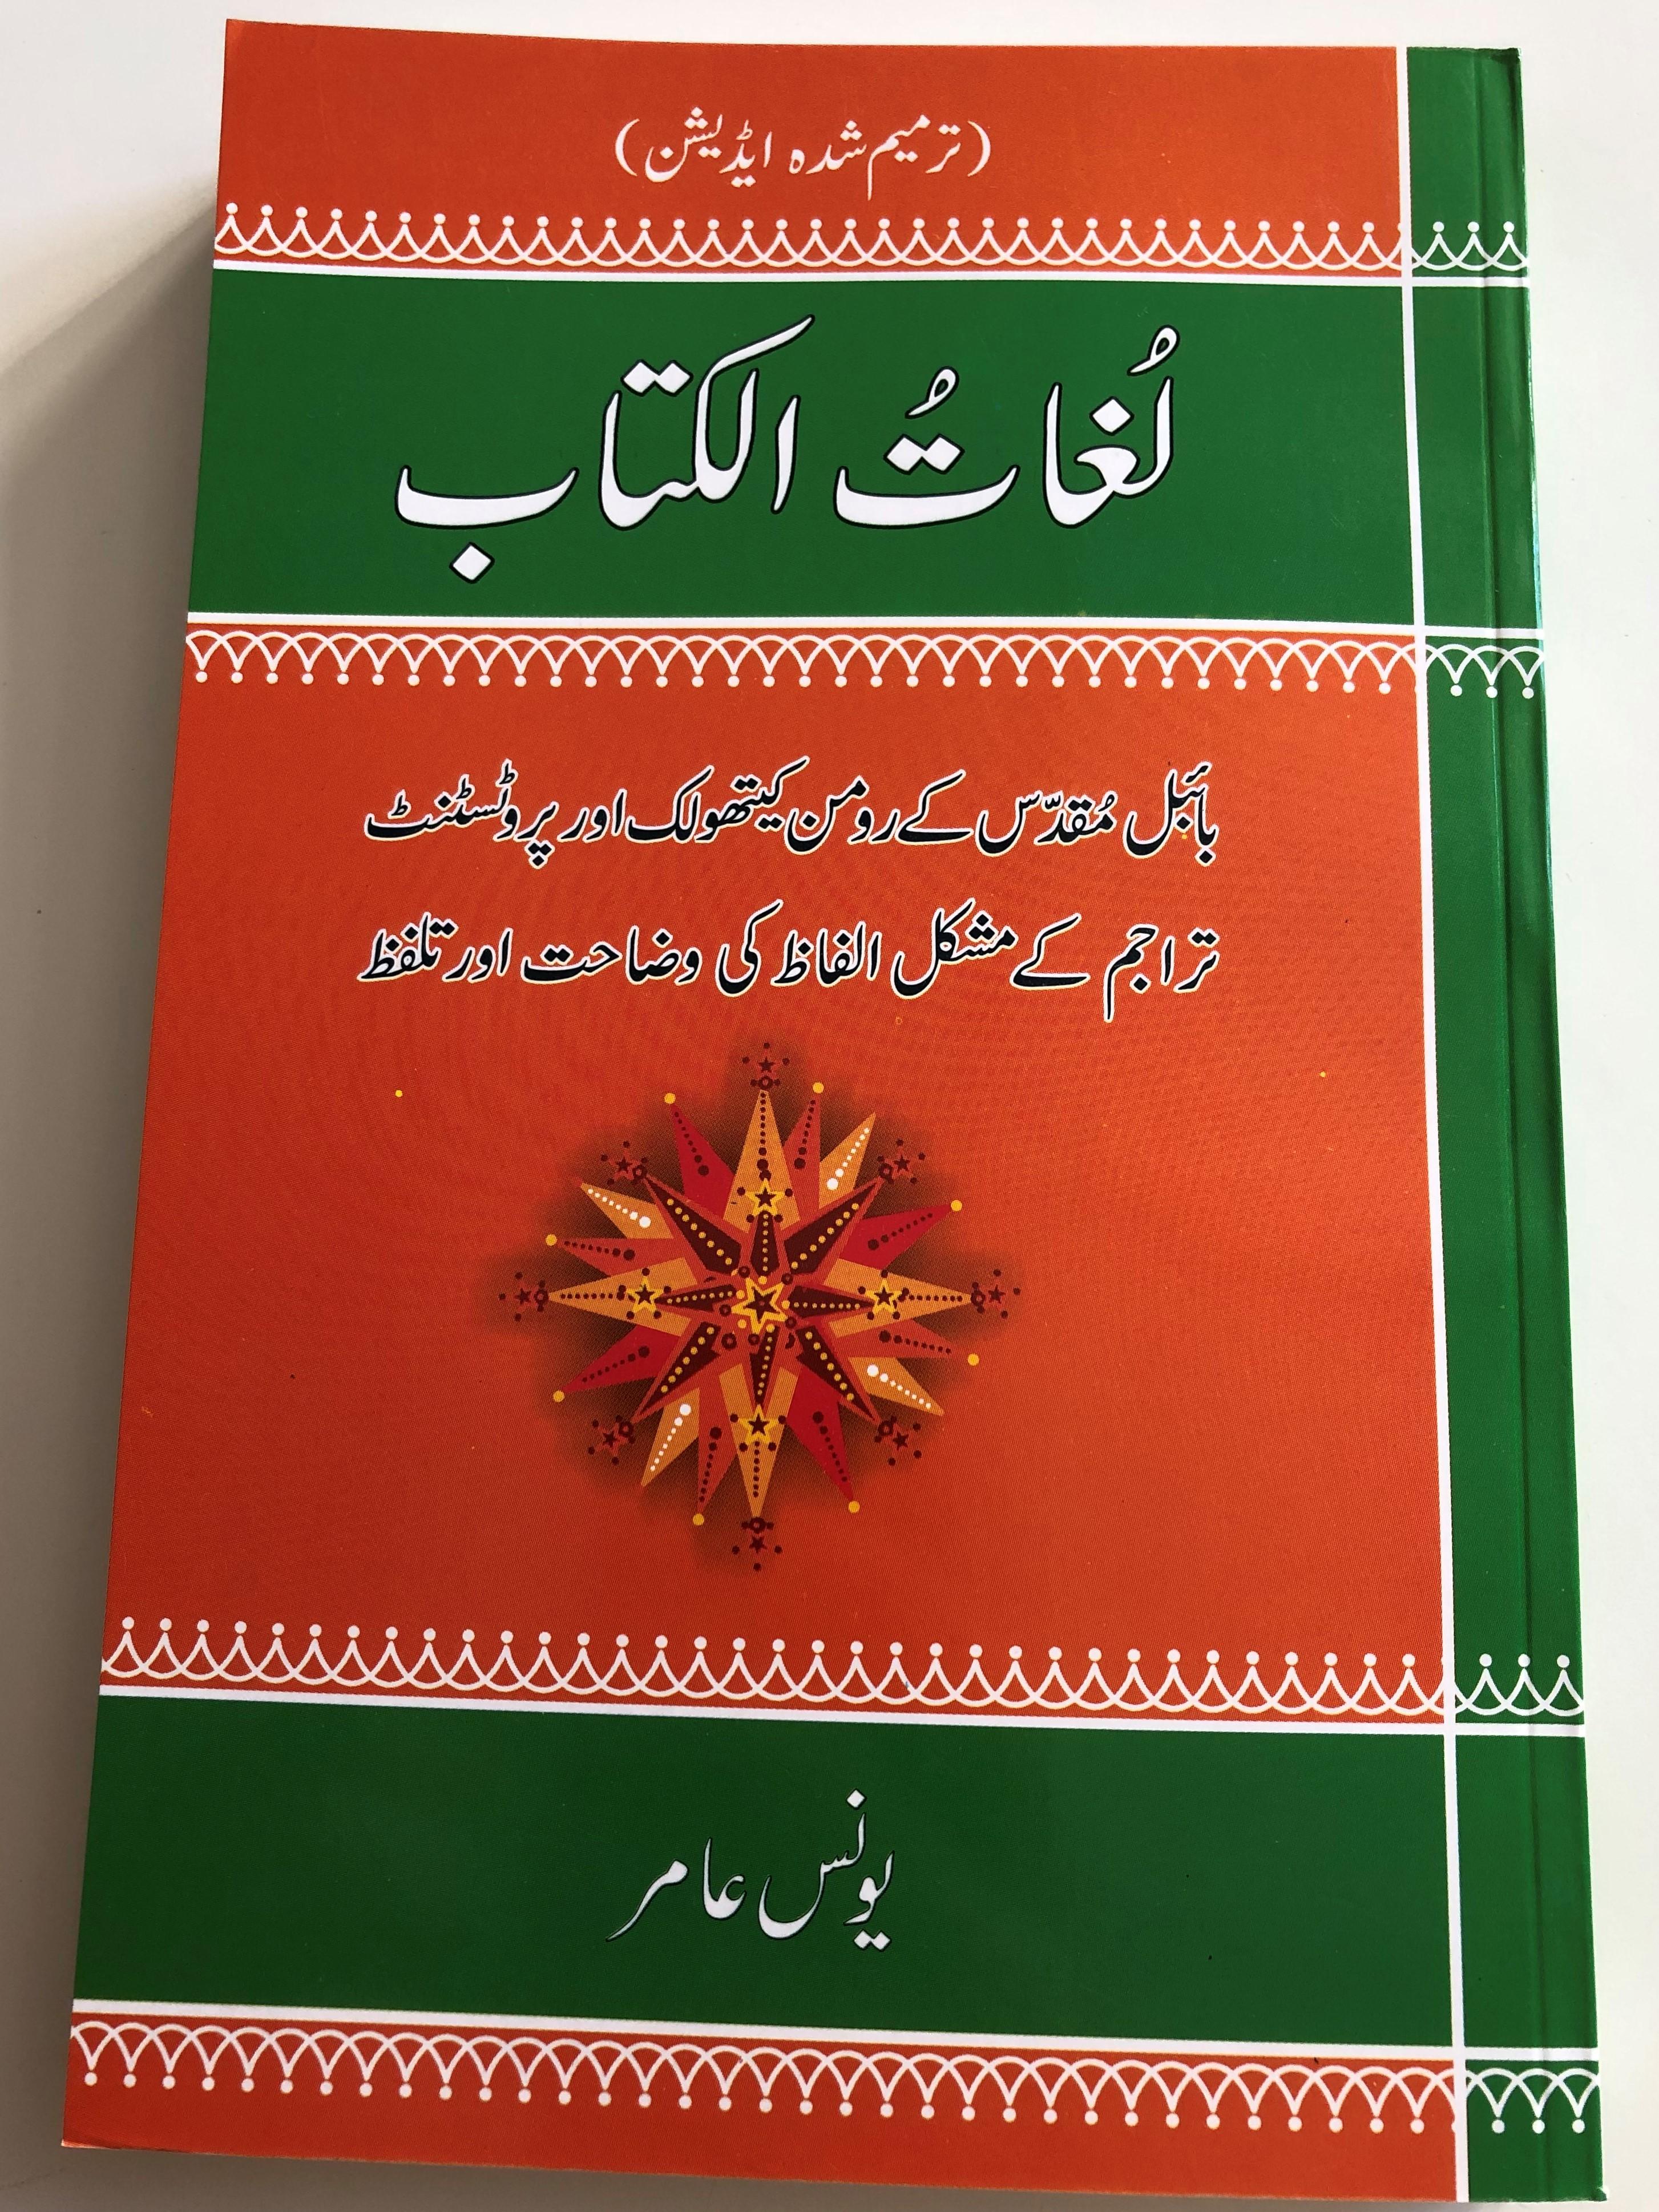 -dictionary-of-difficult-urdu-bible-words-by-younus-aamir-paperback-1-.jpg